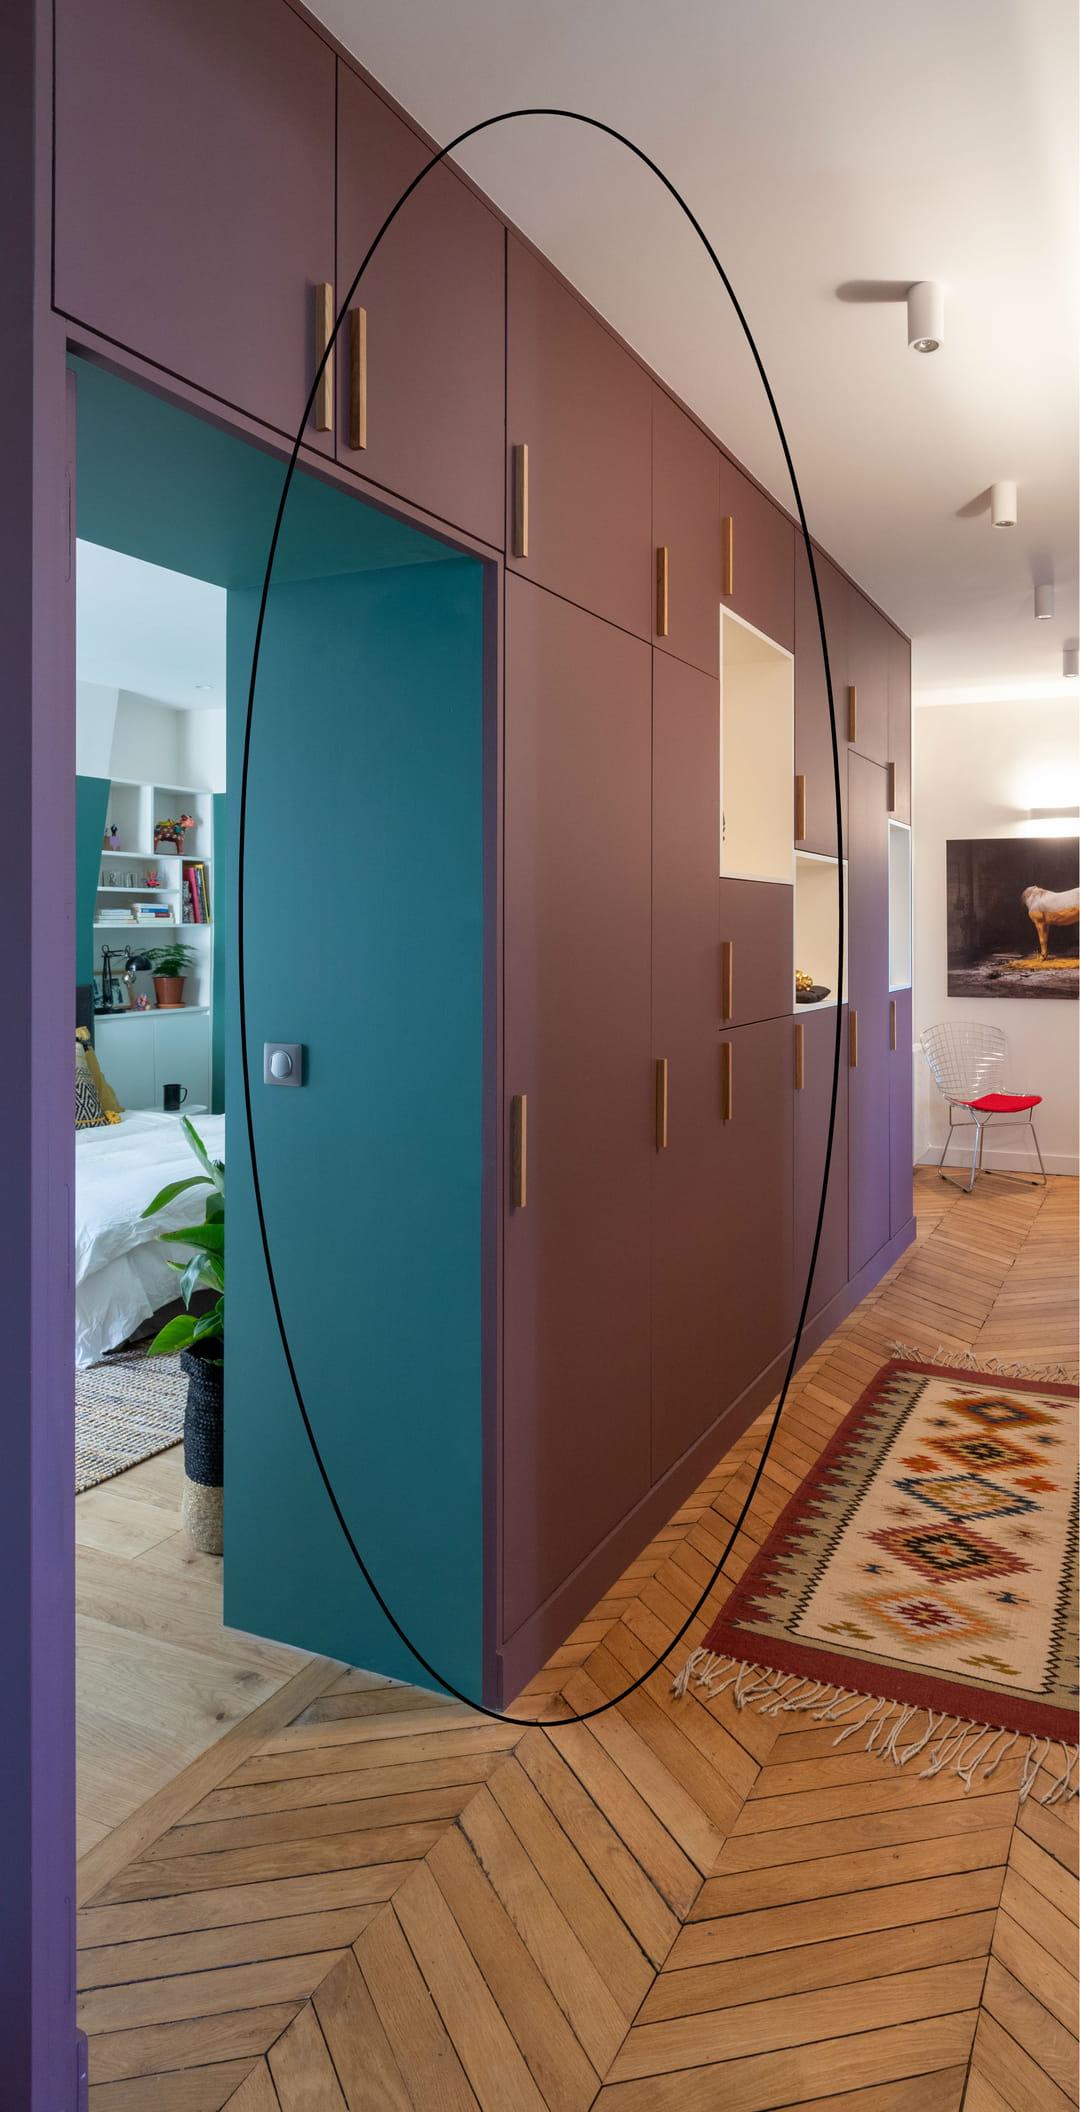 couloir-peinture-aubergine-et-bleu canard